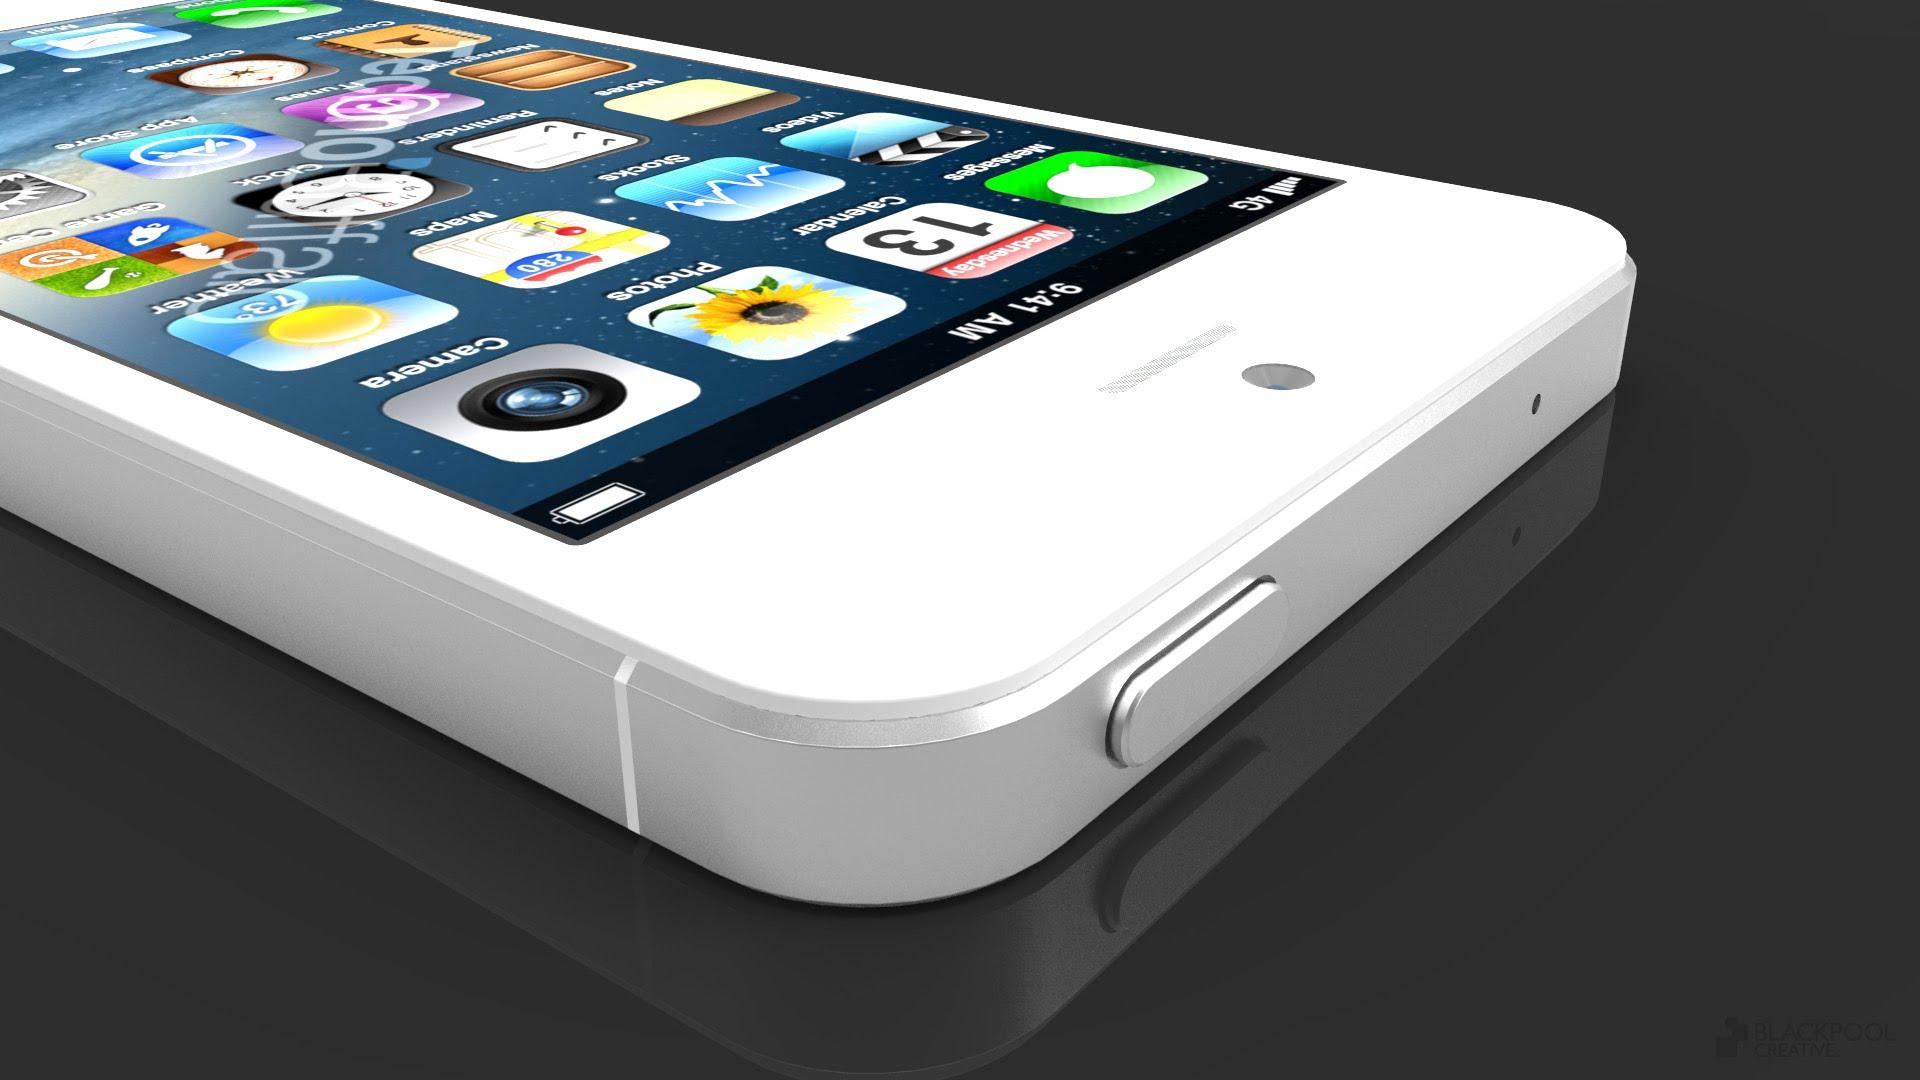 Neues vom iPhone mini: Plastik ja, Retina nein